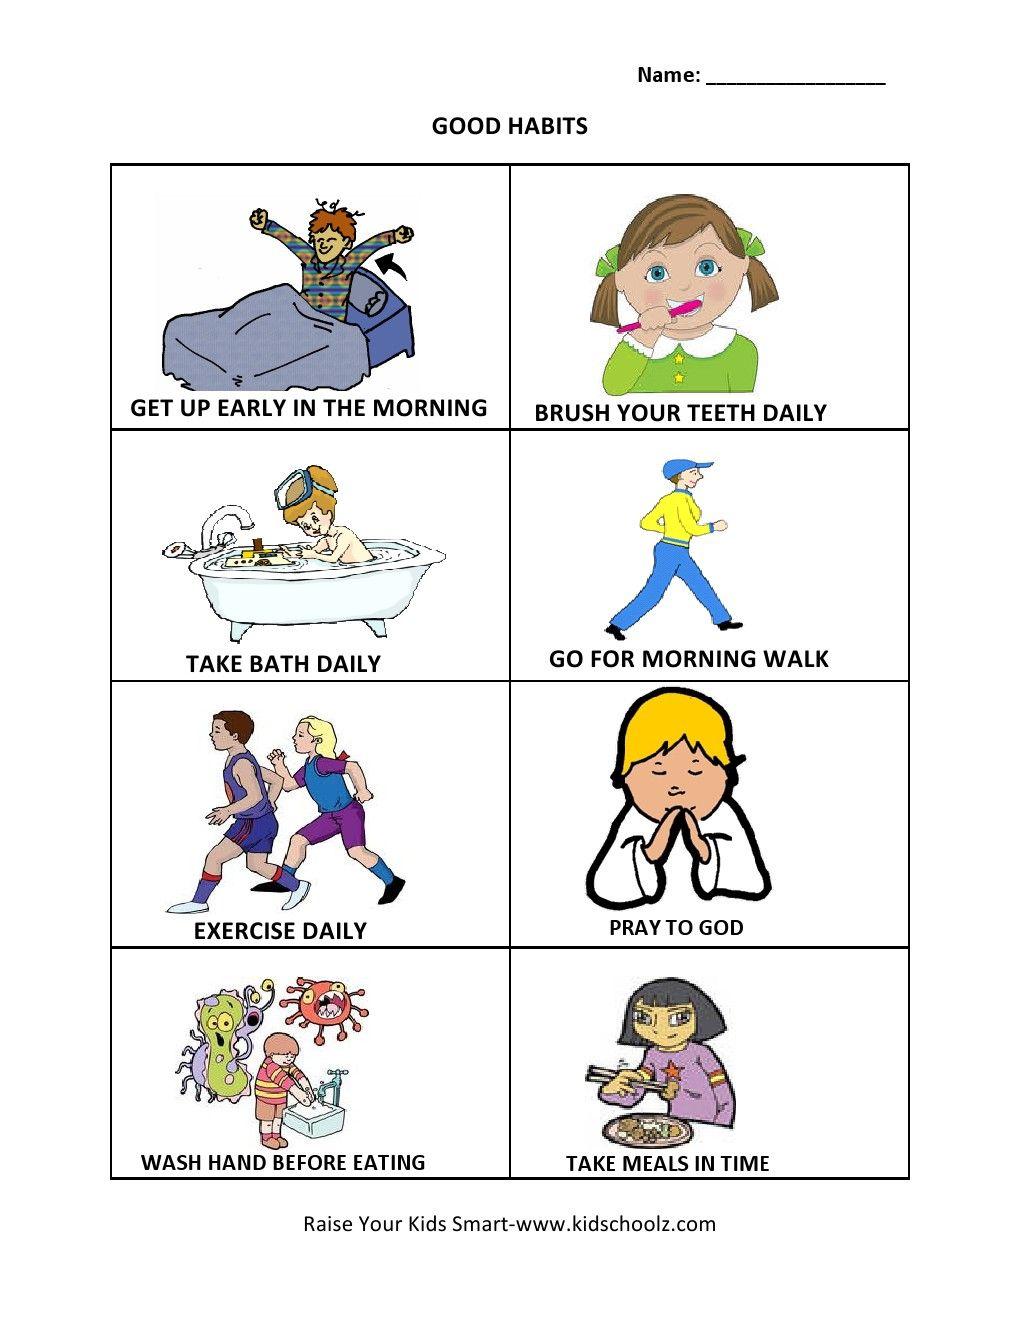 Grade 1 - Good Habits Worksheet -   Good habits for kids [ 1320 x 1020 Pixel ]